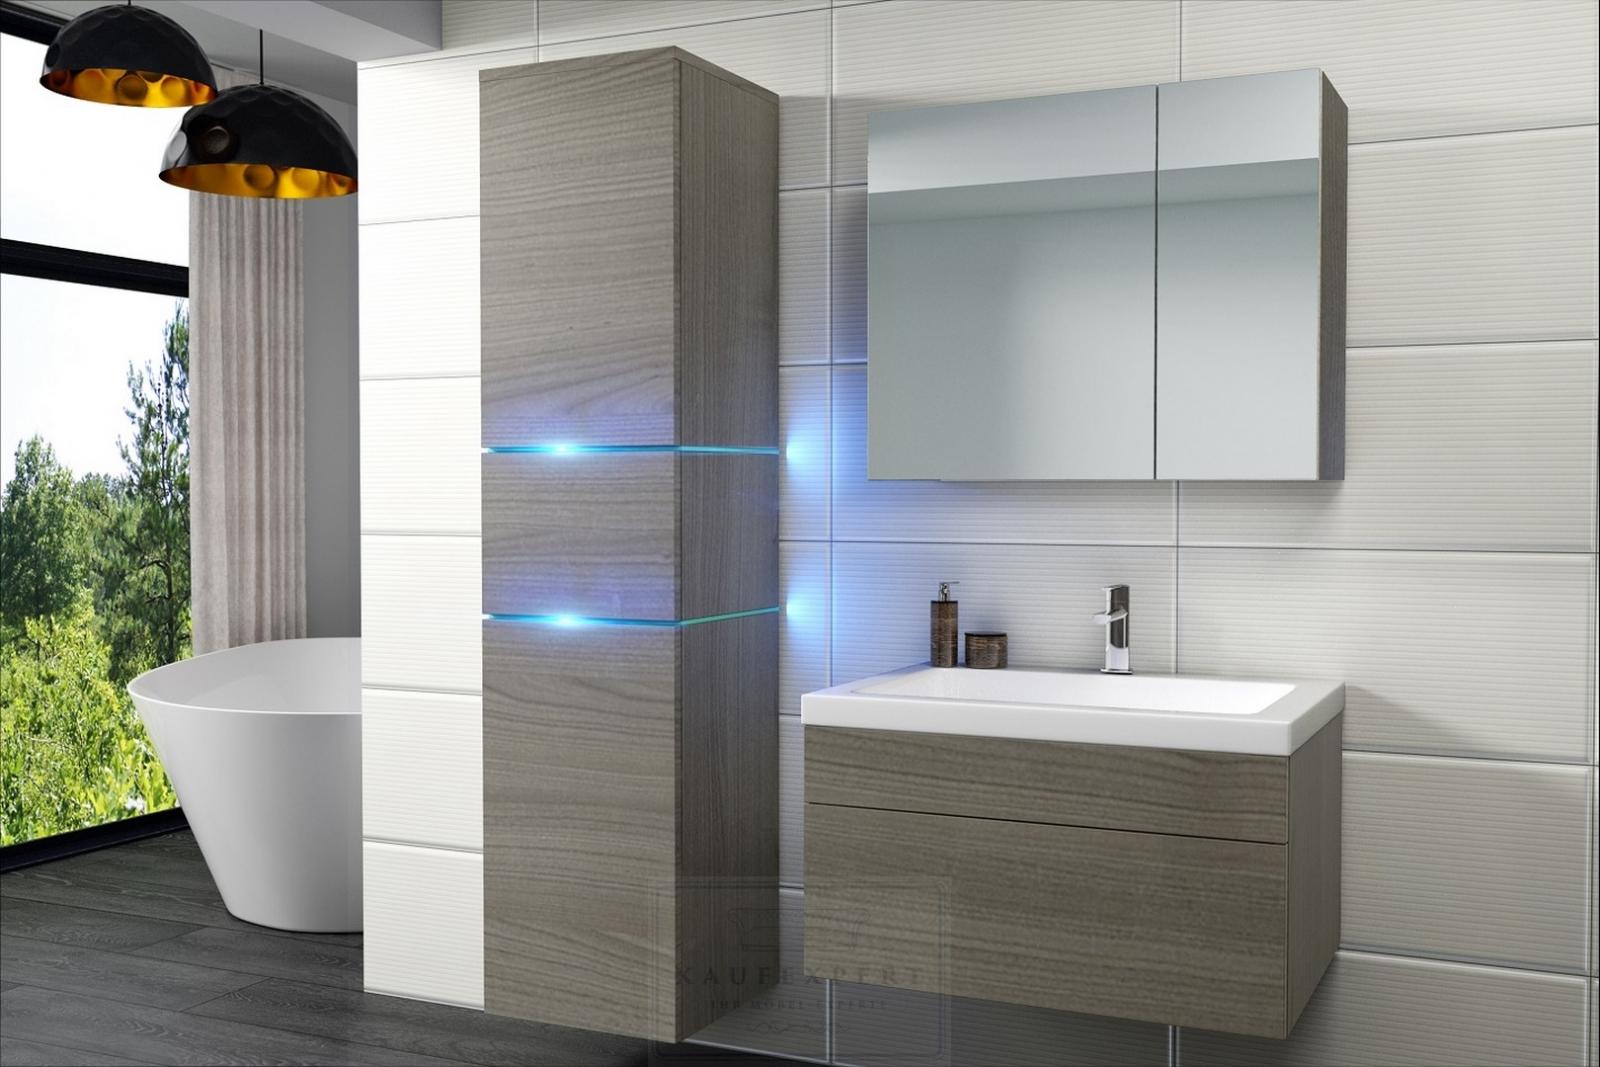 badezimmer keramik   huboonline, Hause ideen